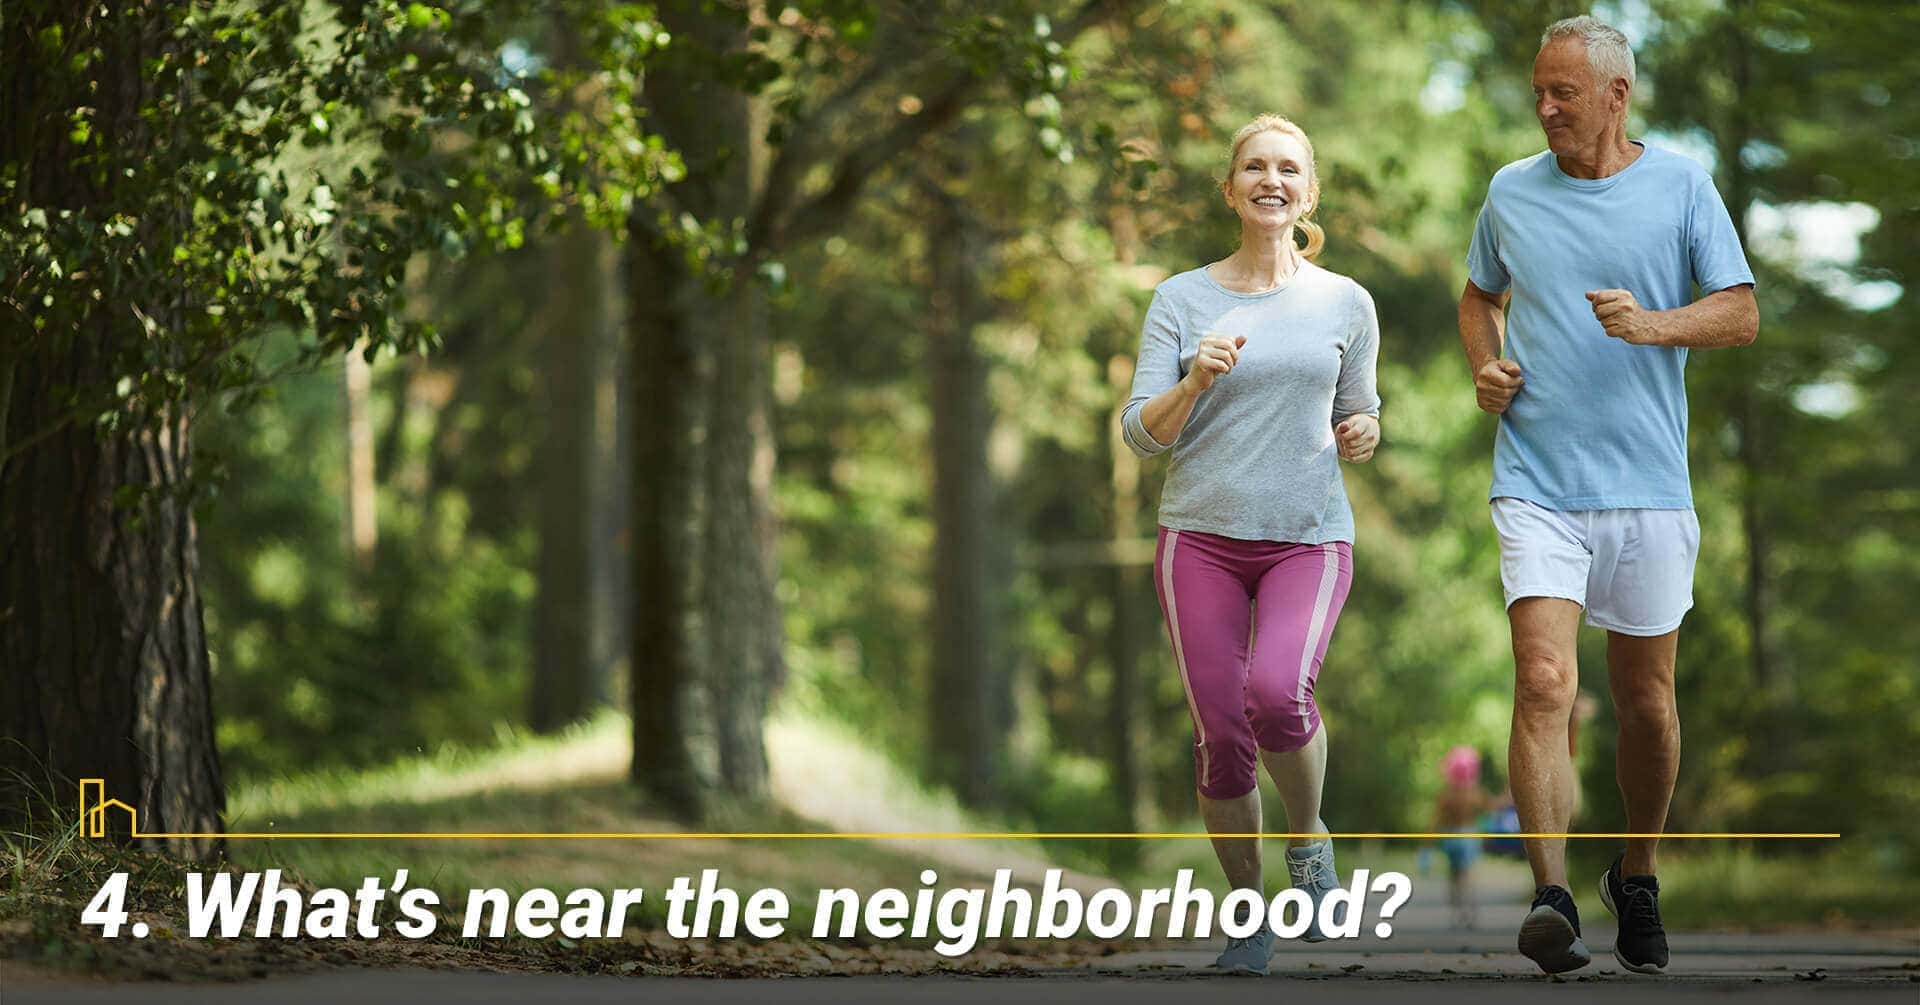 What's near the neighborhood? Other amenities around the neighborhood